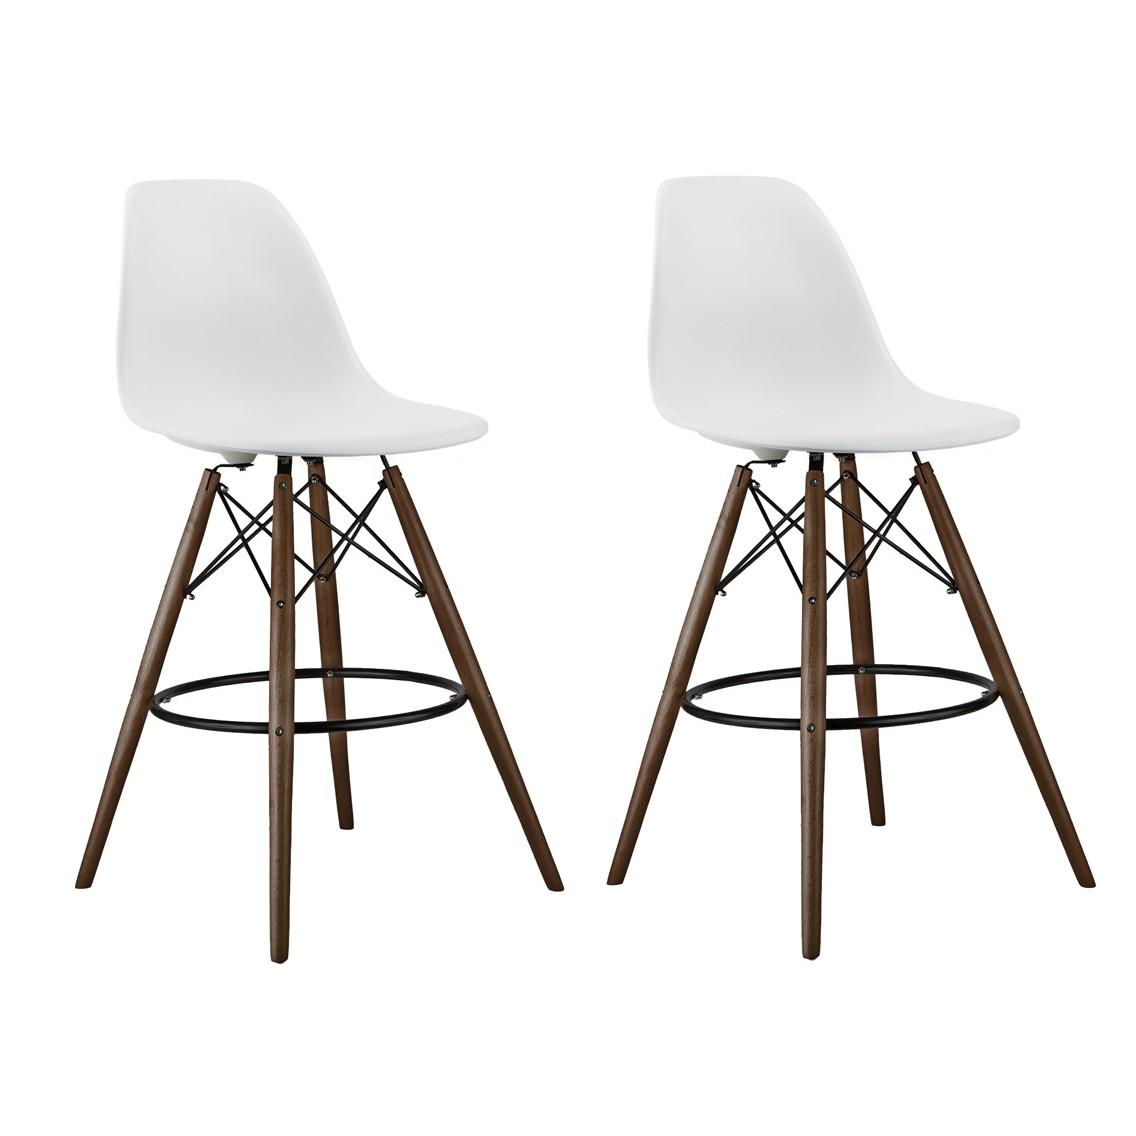 Set Of 2 White Eames Style Dsw Stool With Dark Walnut Wood